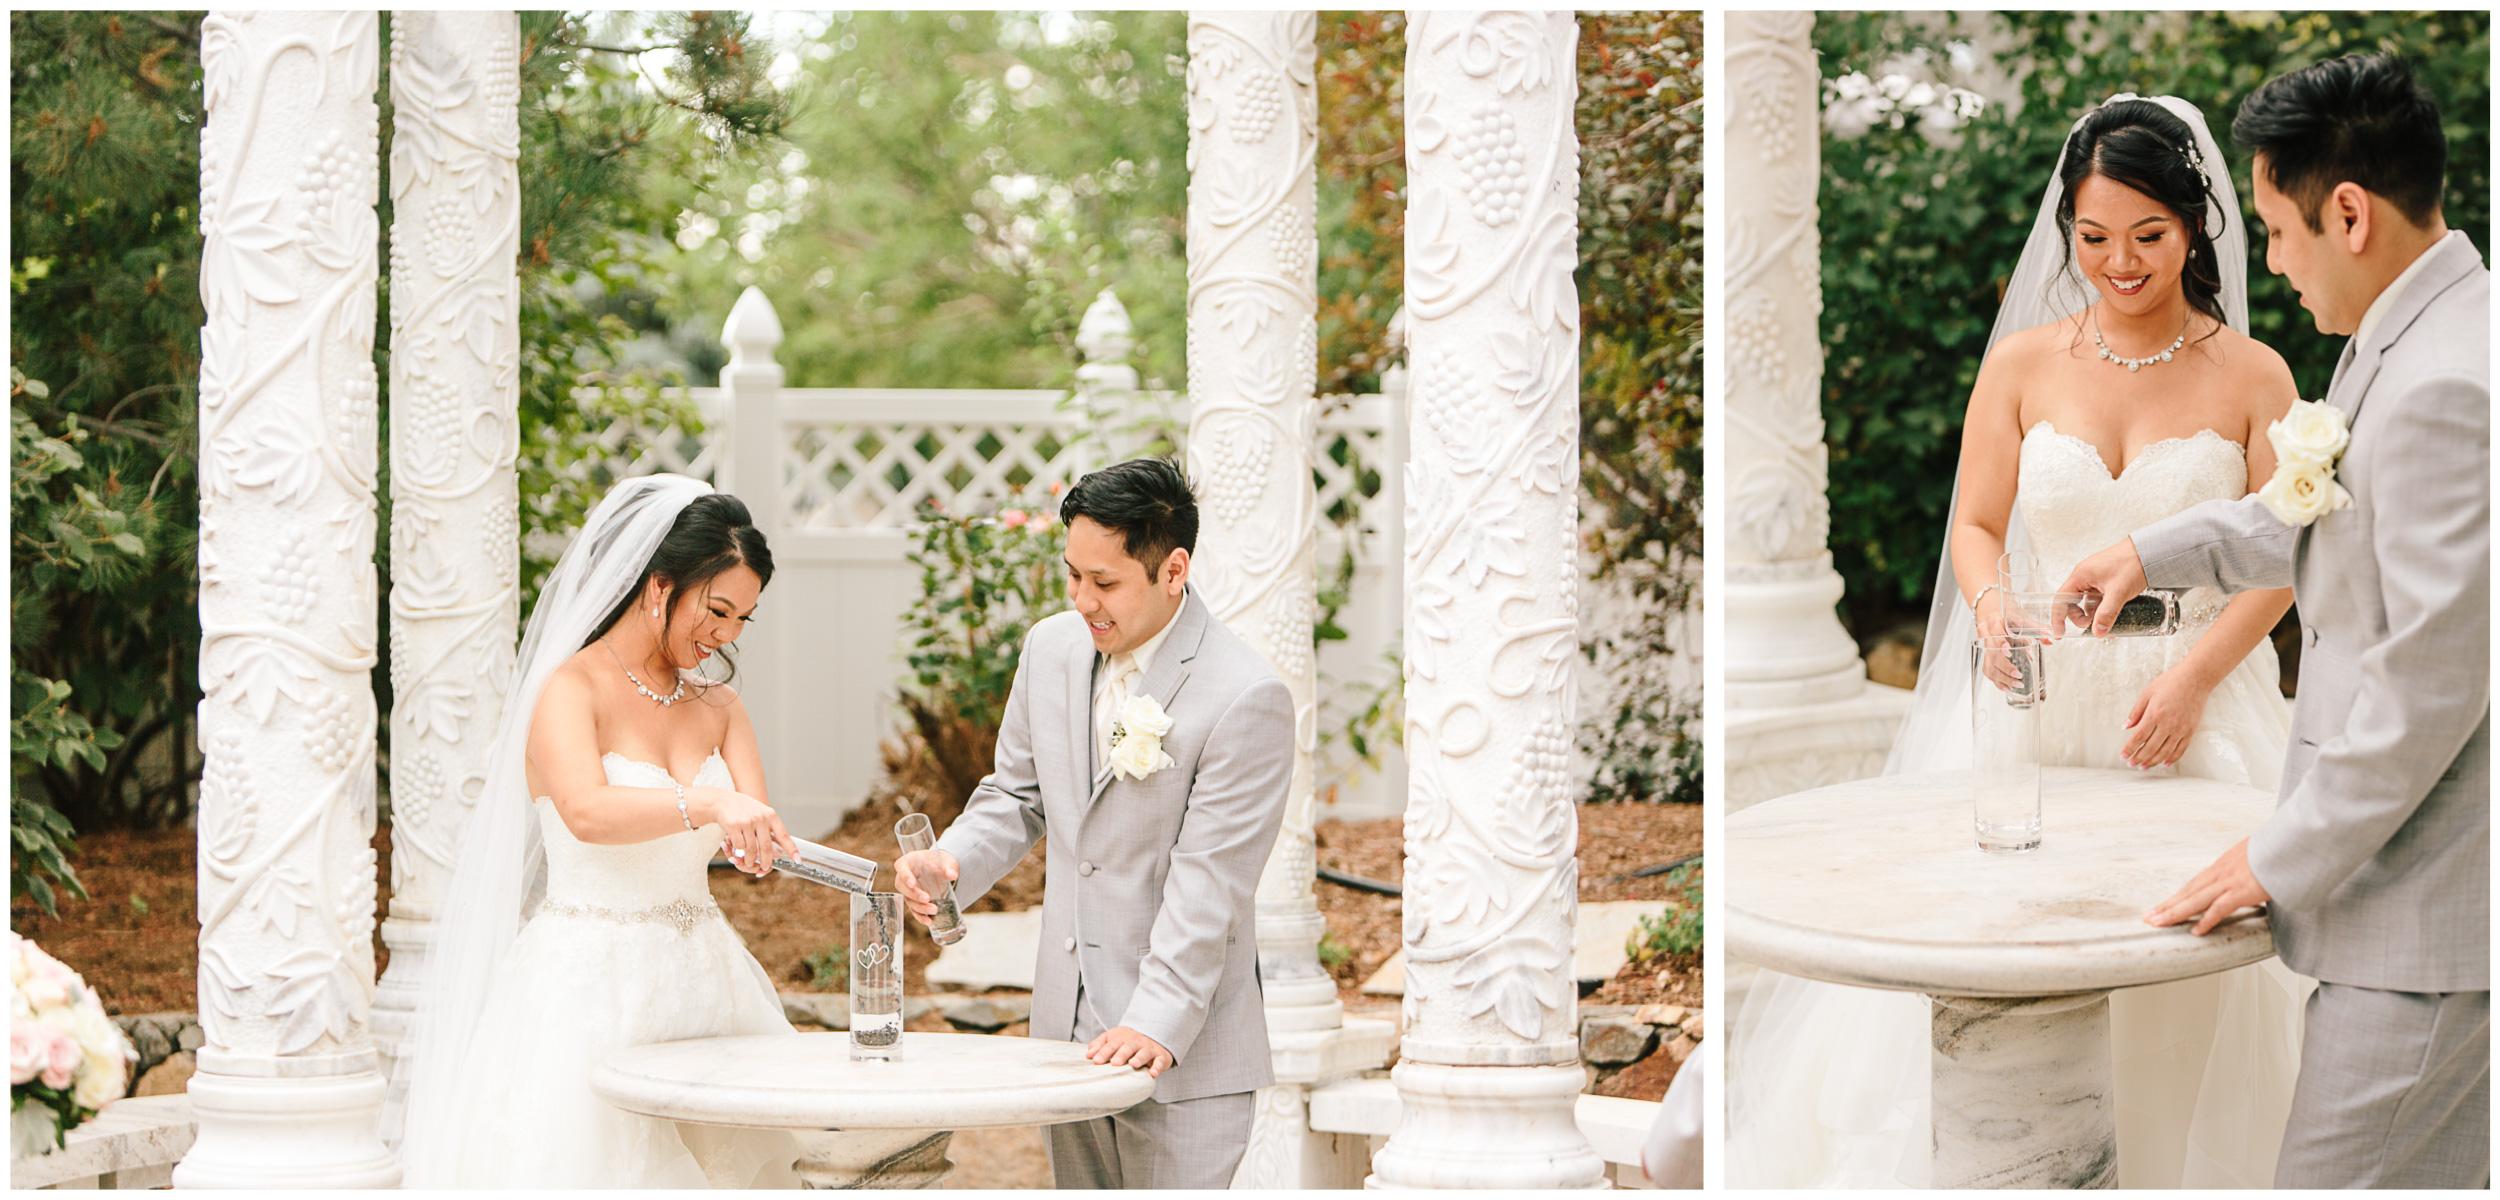 stonebrook_manor_wedding_41.jpg